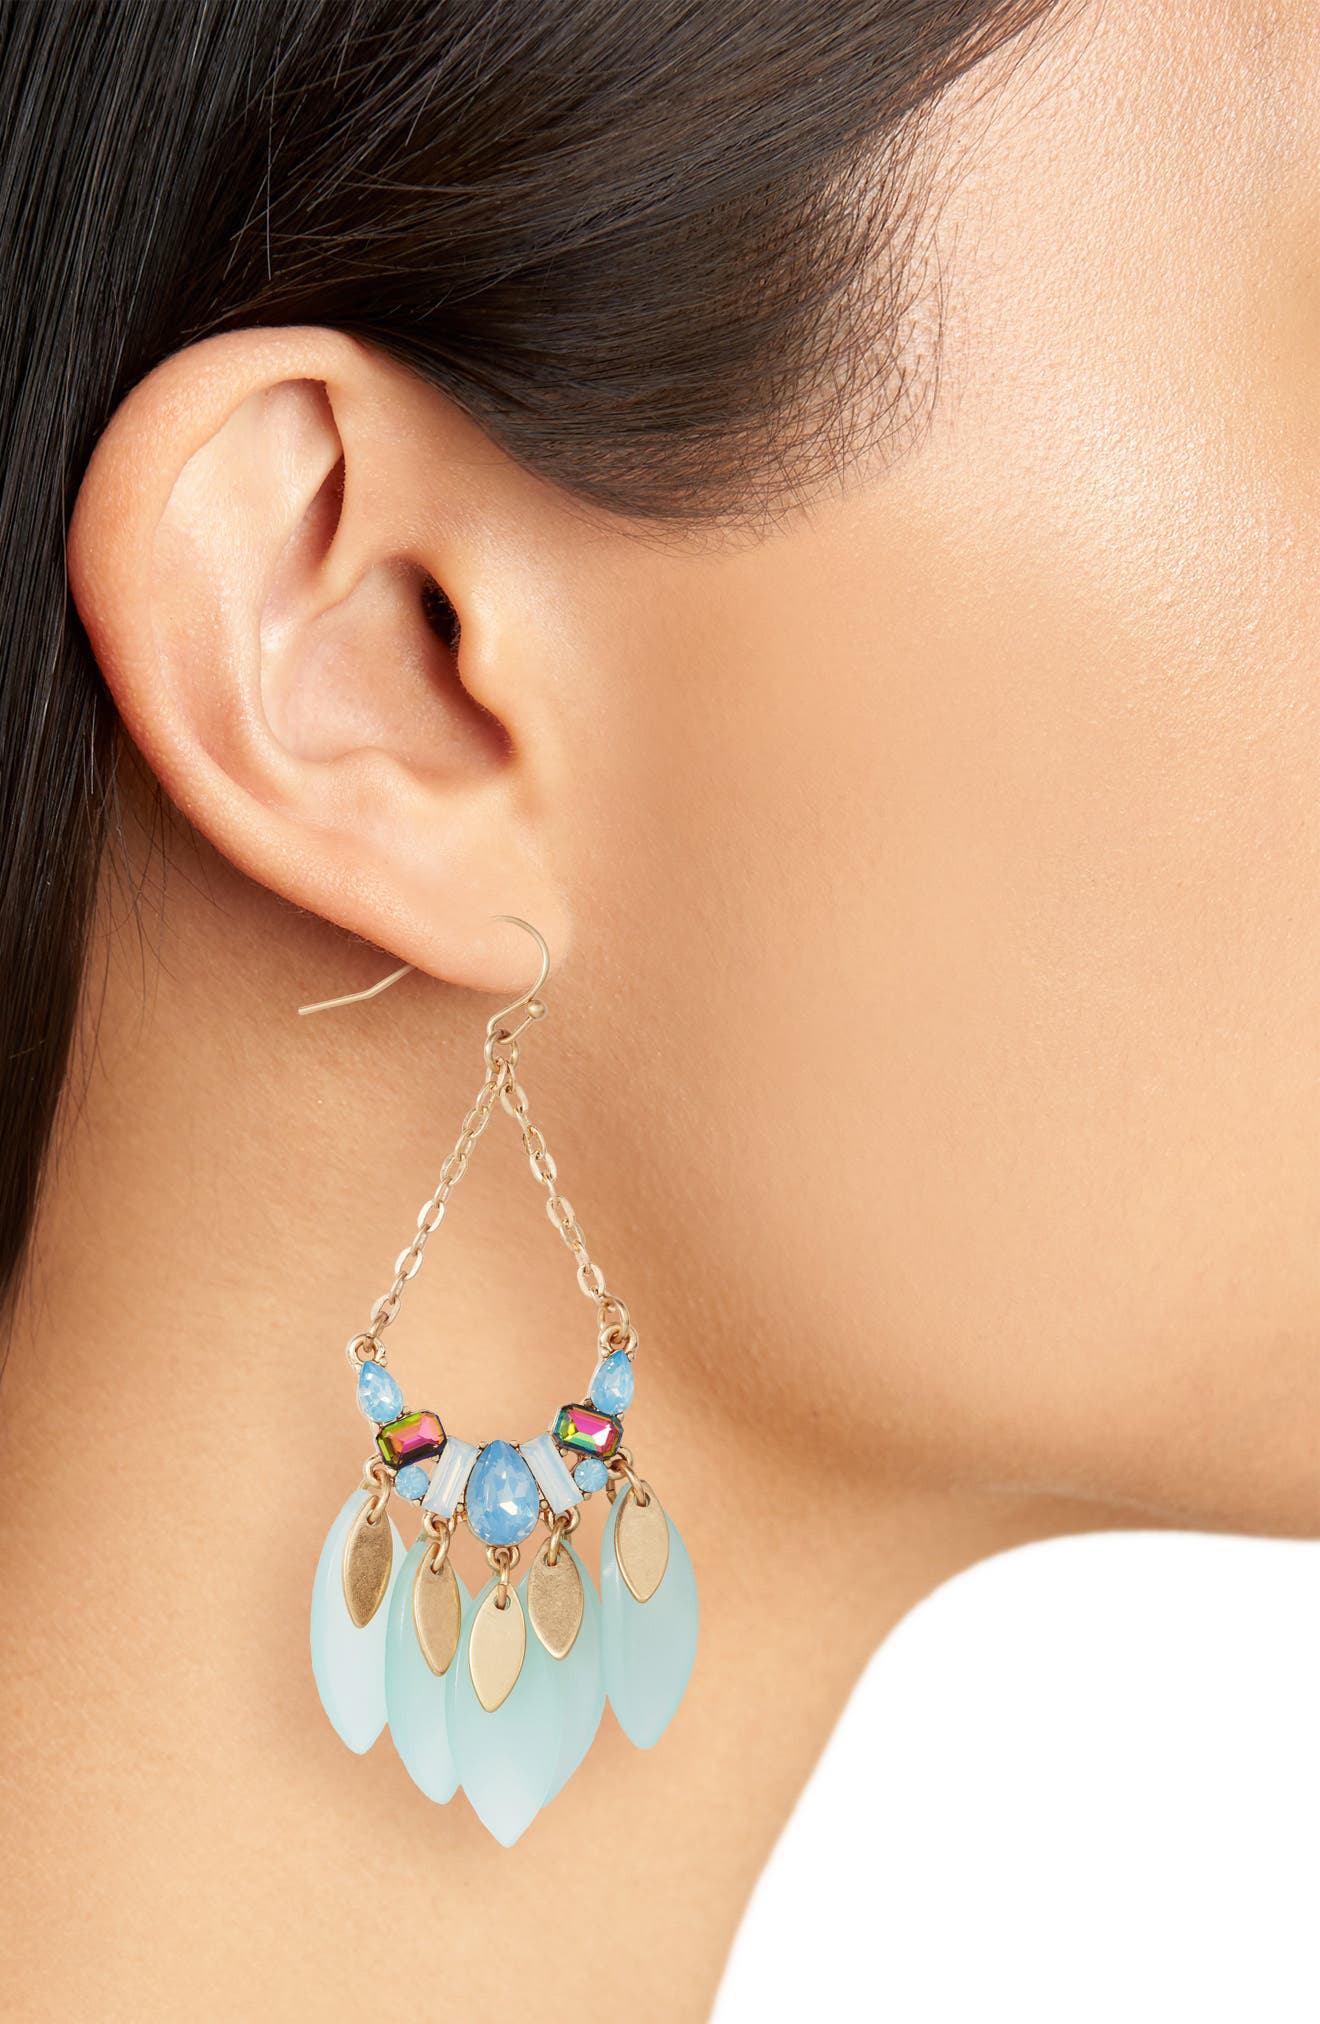 Petal Teardrop Earrings,                             Alternate thumbnail 2, color,                             Blue Opal- Gold